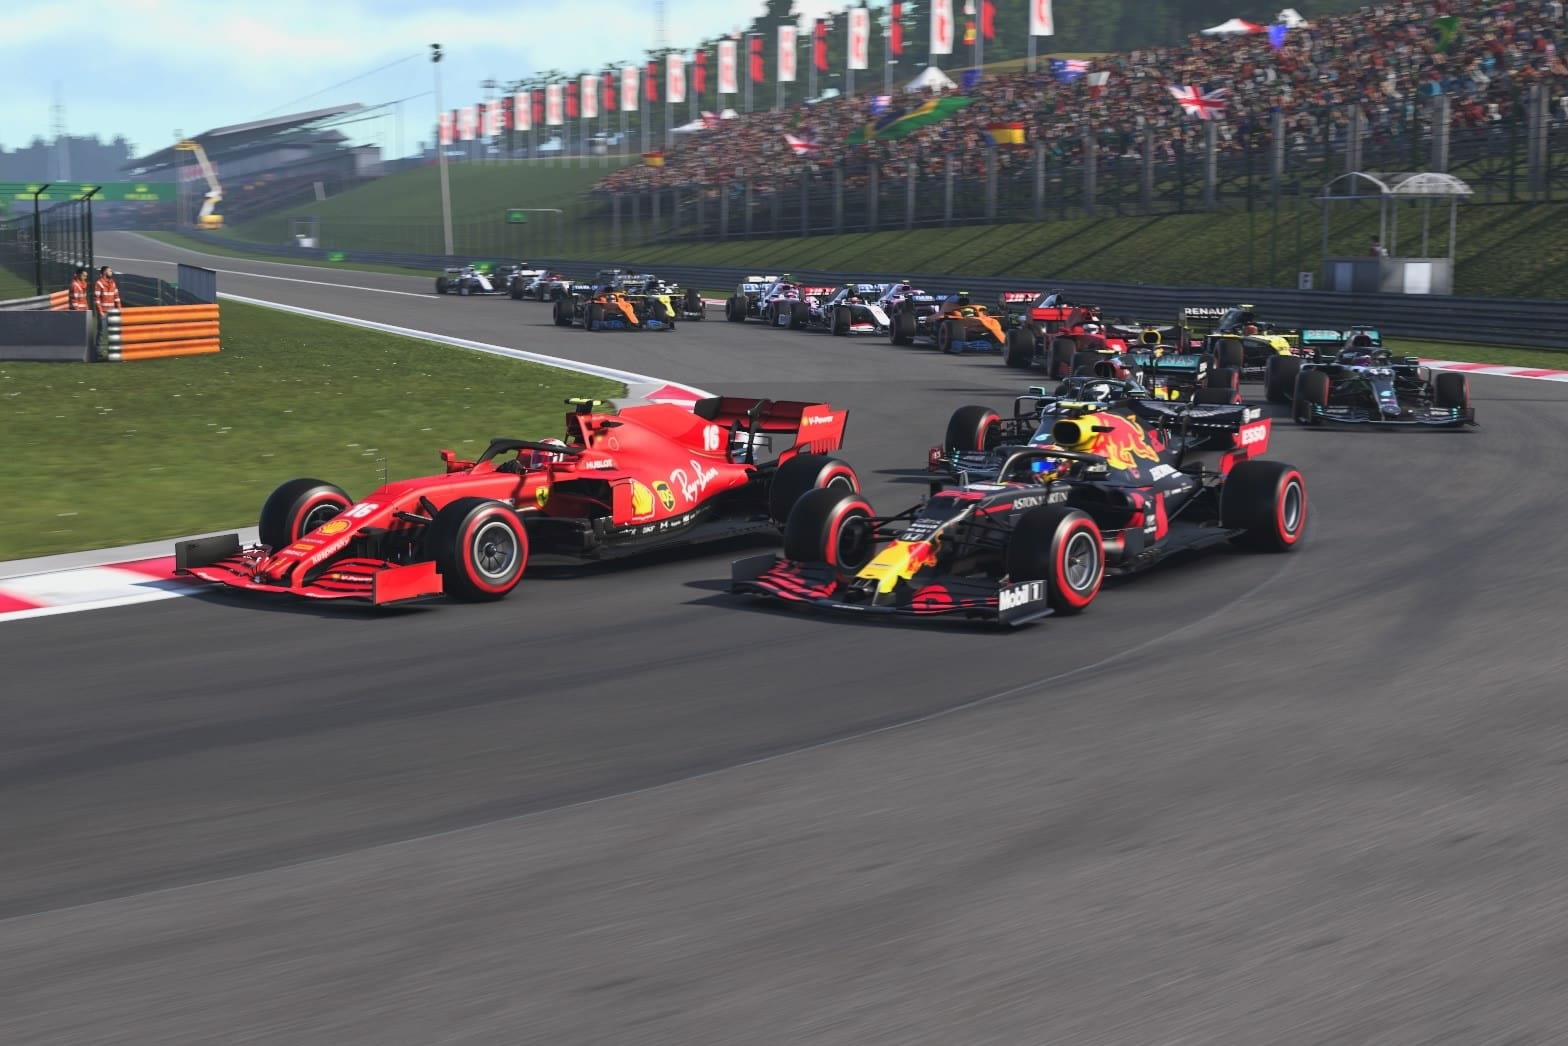 F1 2021 Ea Sports / Ea Confirm Codemasters Takeover Ahead ...